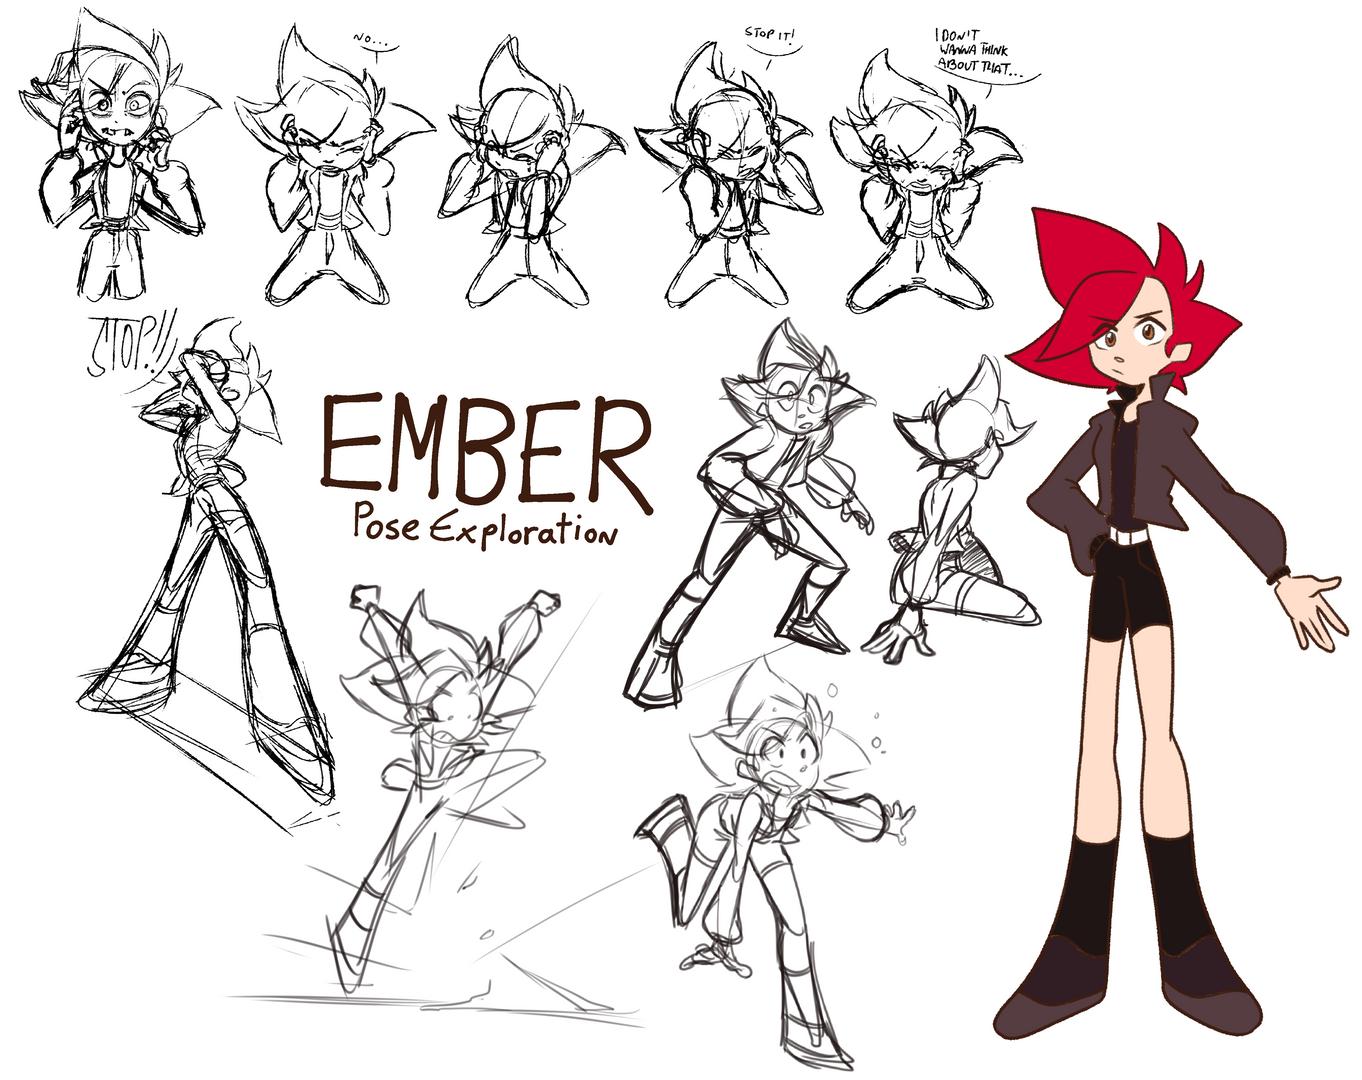 Ember Pose Exploration